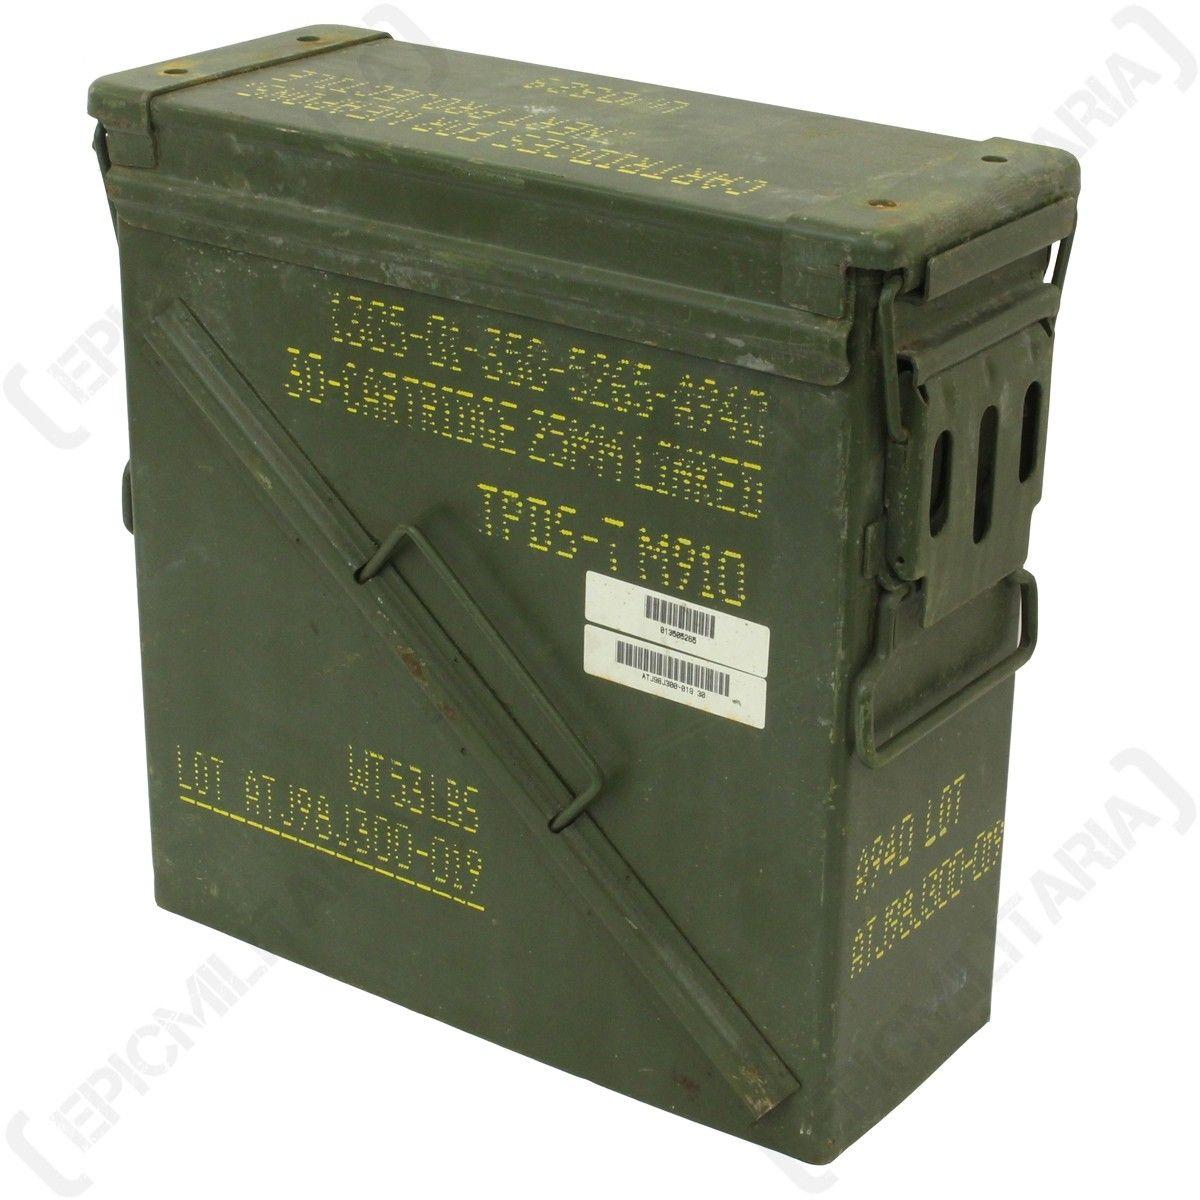 Original 30 Cartridge 25mm Ammo Tin Ammo Military Box Ammo Cans